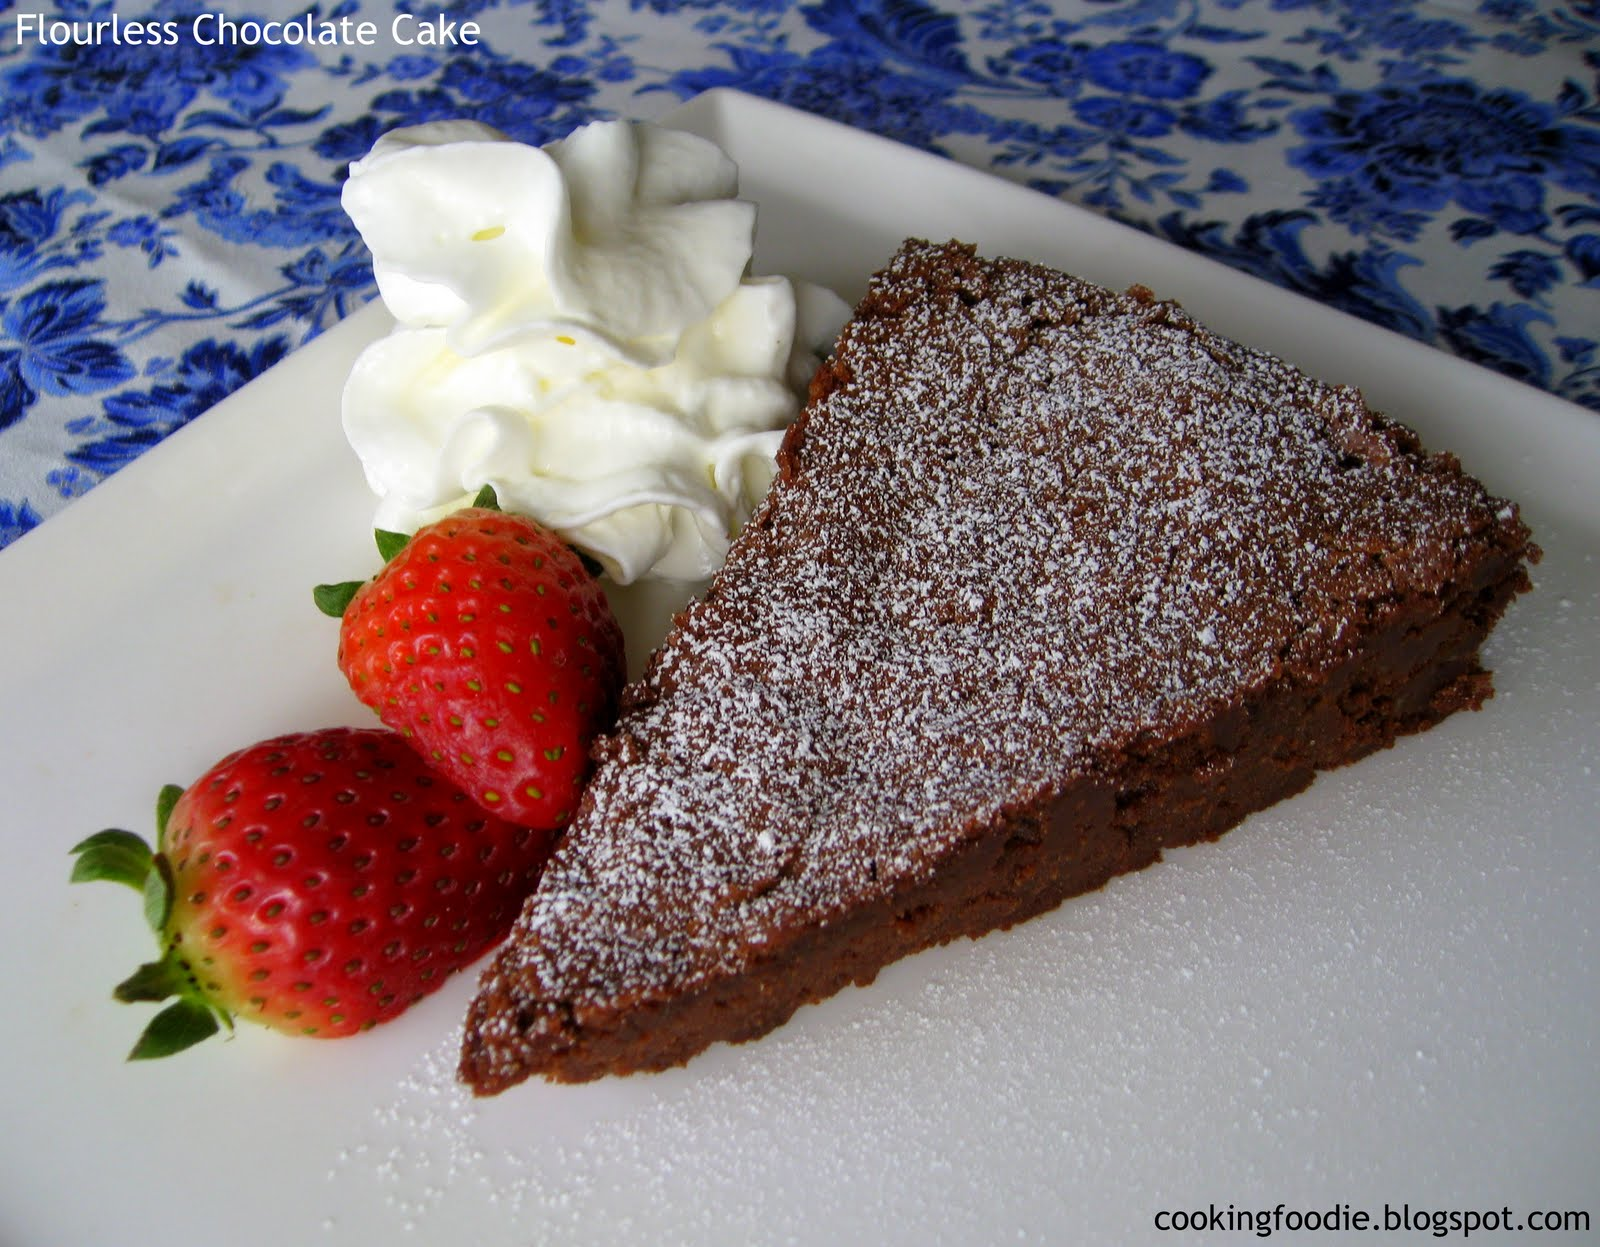 365 days of Eating: Flourless Chocolate Cake